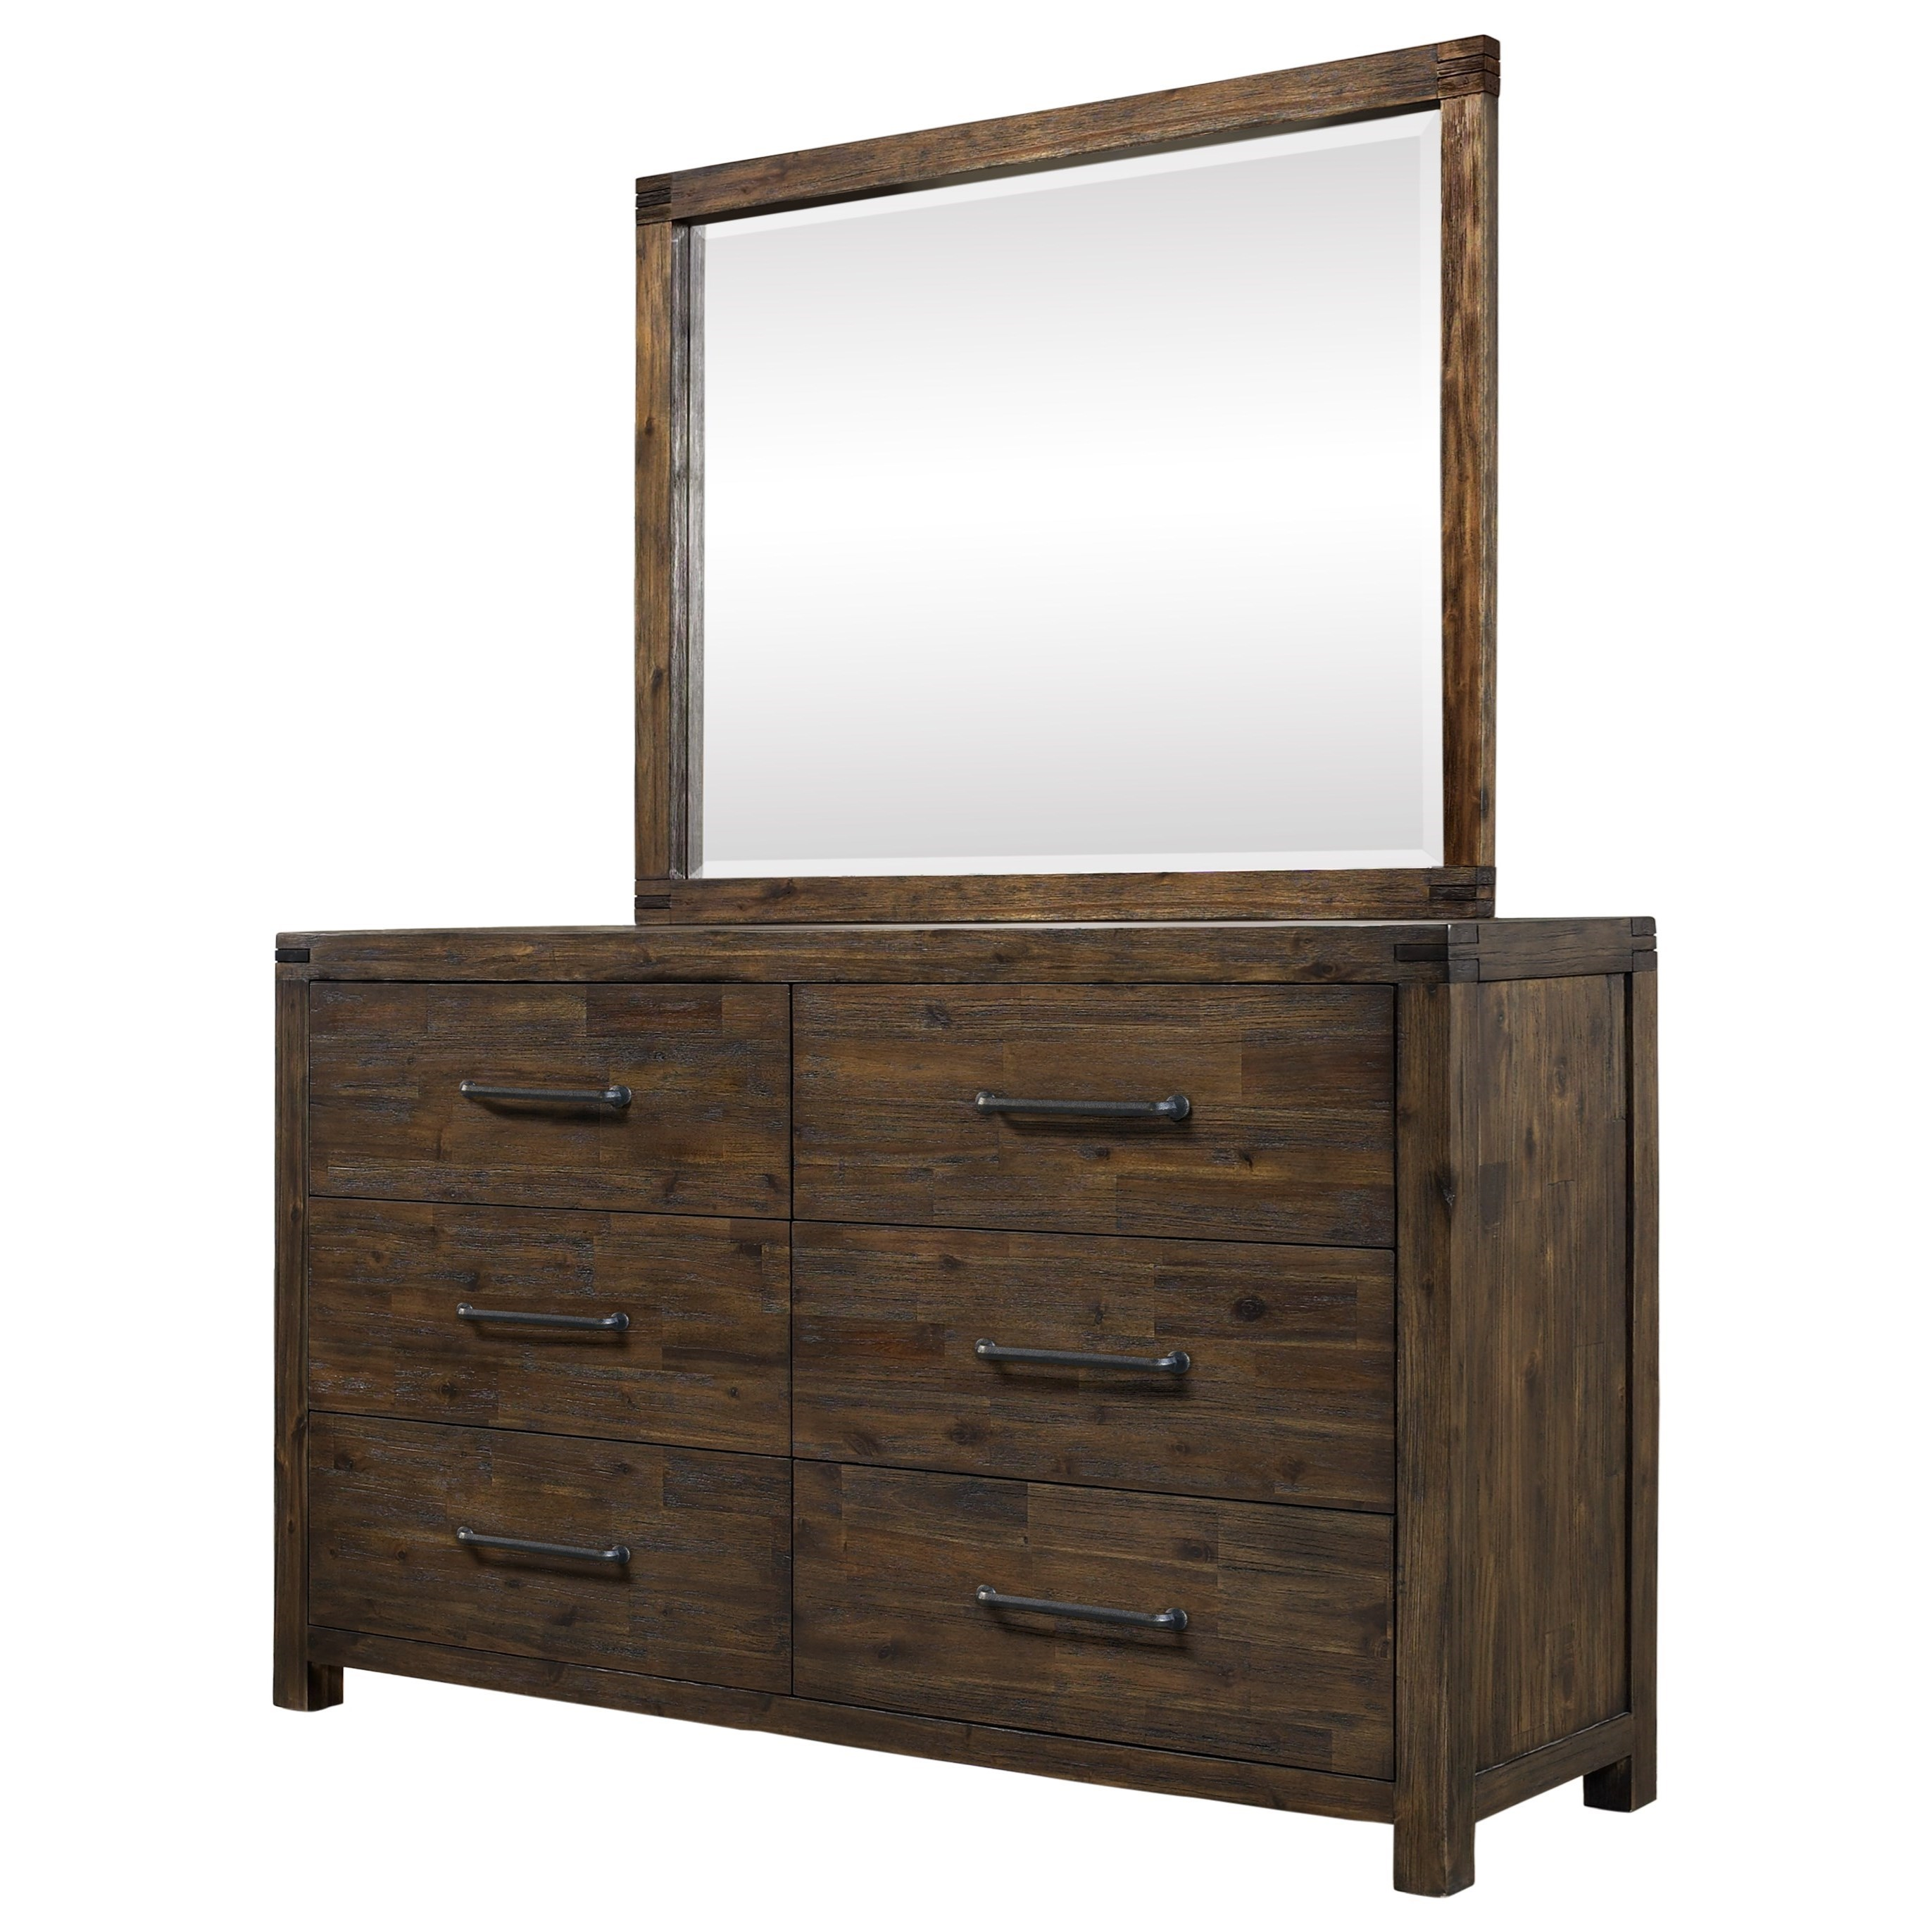 Hillsdale Gannon Dresser and Mirror Set - Item Number: 2078-786+722